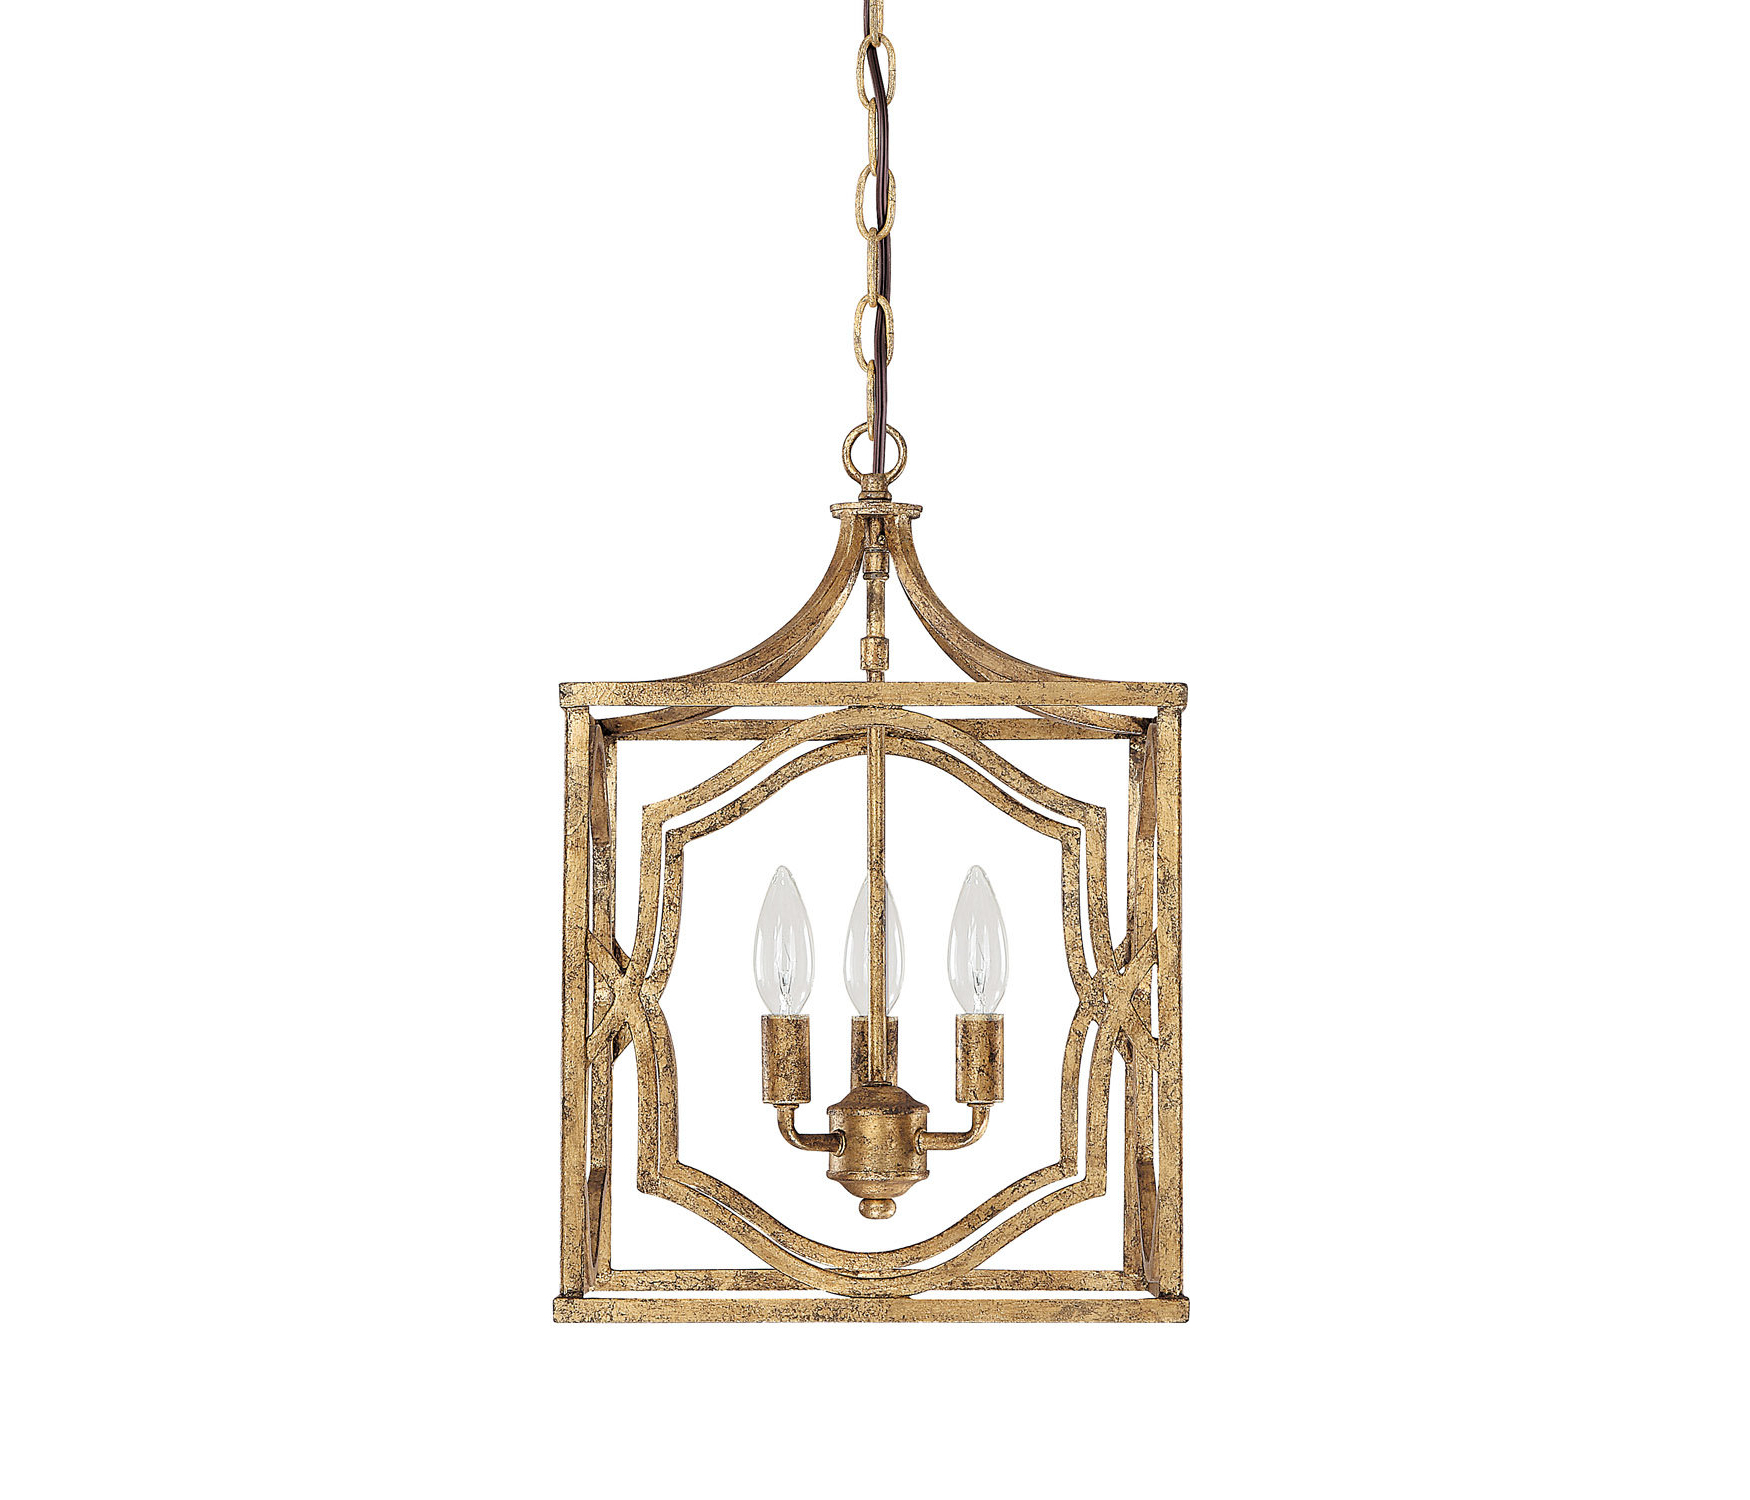 Armande 3 Light Lantern Geometric Pendants With 2019 Myrtle 3 Light Lantern Square/rectangle Pendant & Reviews (View 6 of 20)